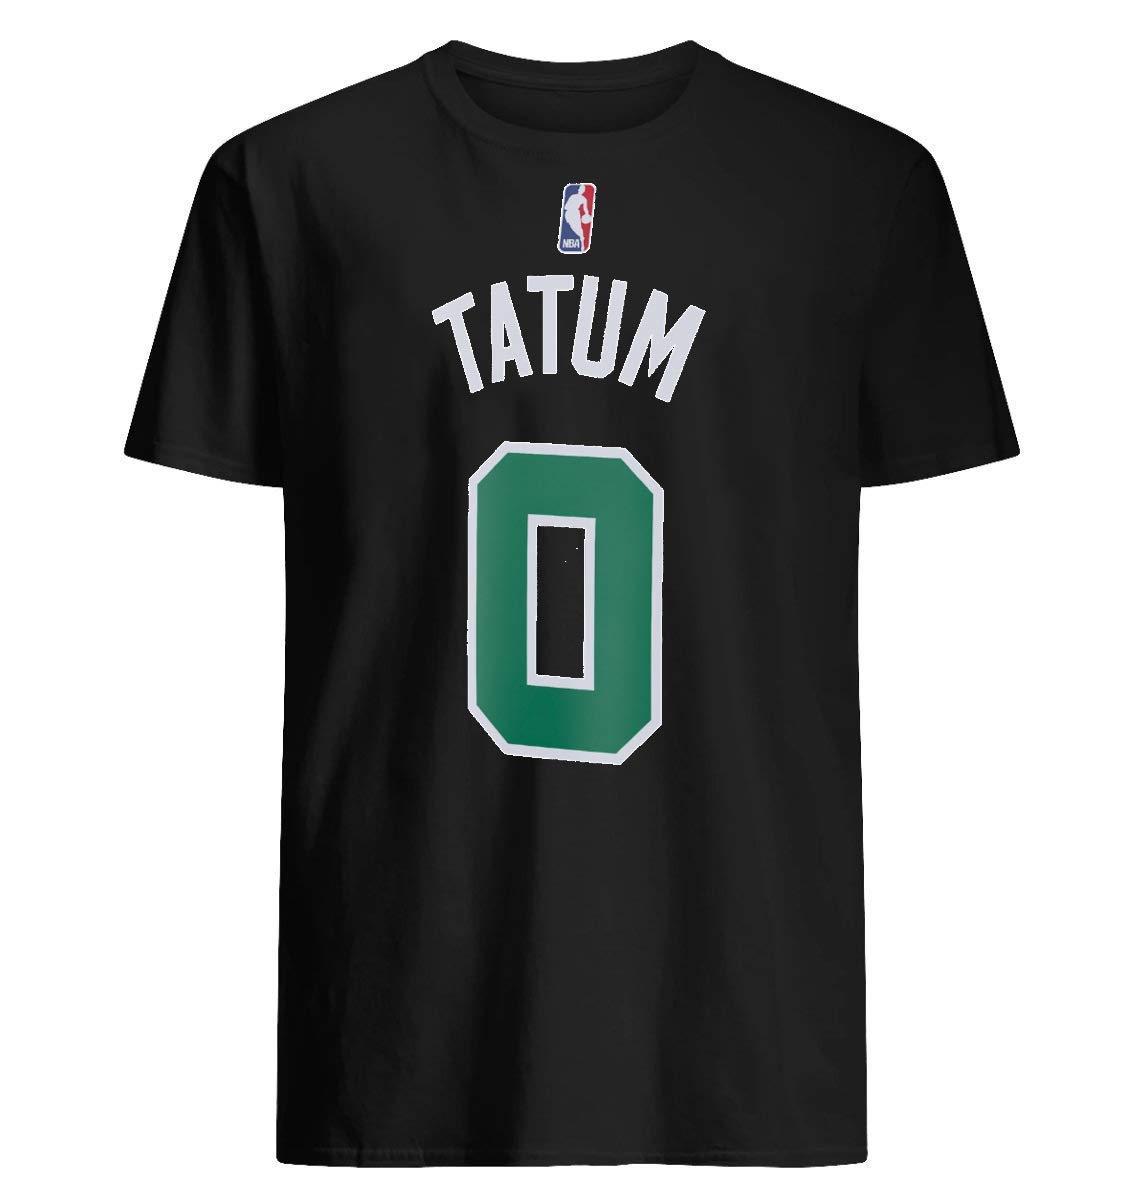 newest 30766 4acf4 Amazon.com: Jayson tatum jersey High quality men_s T-shirts ...